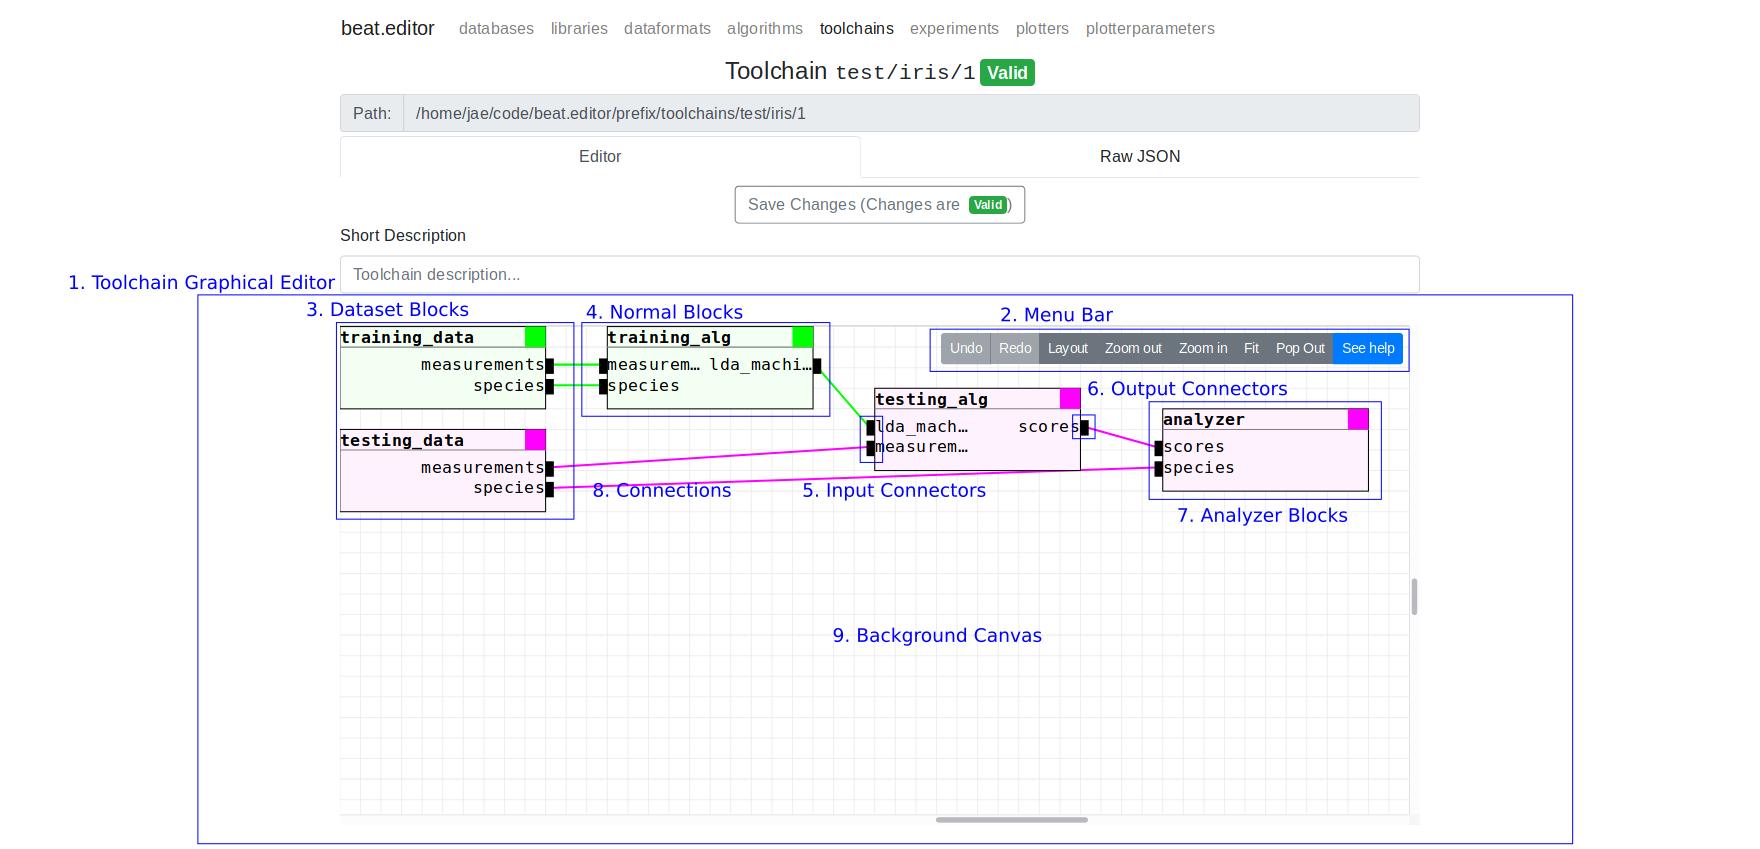 doc/img/editor_toolchain_breakdown.png